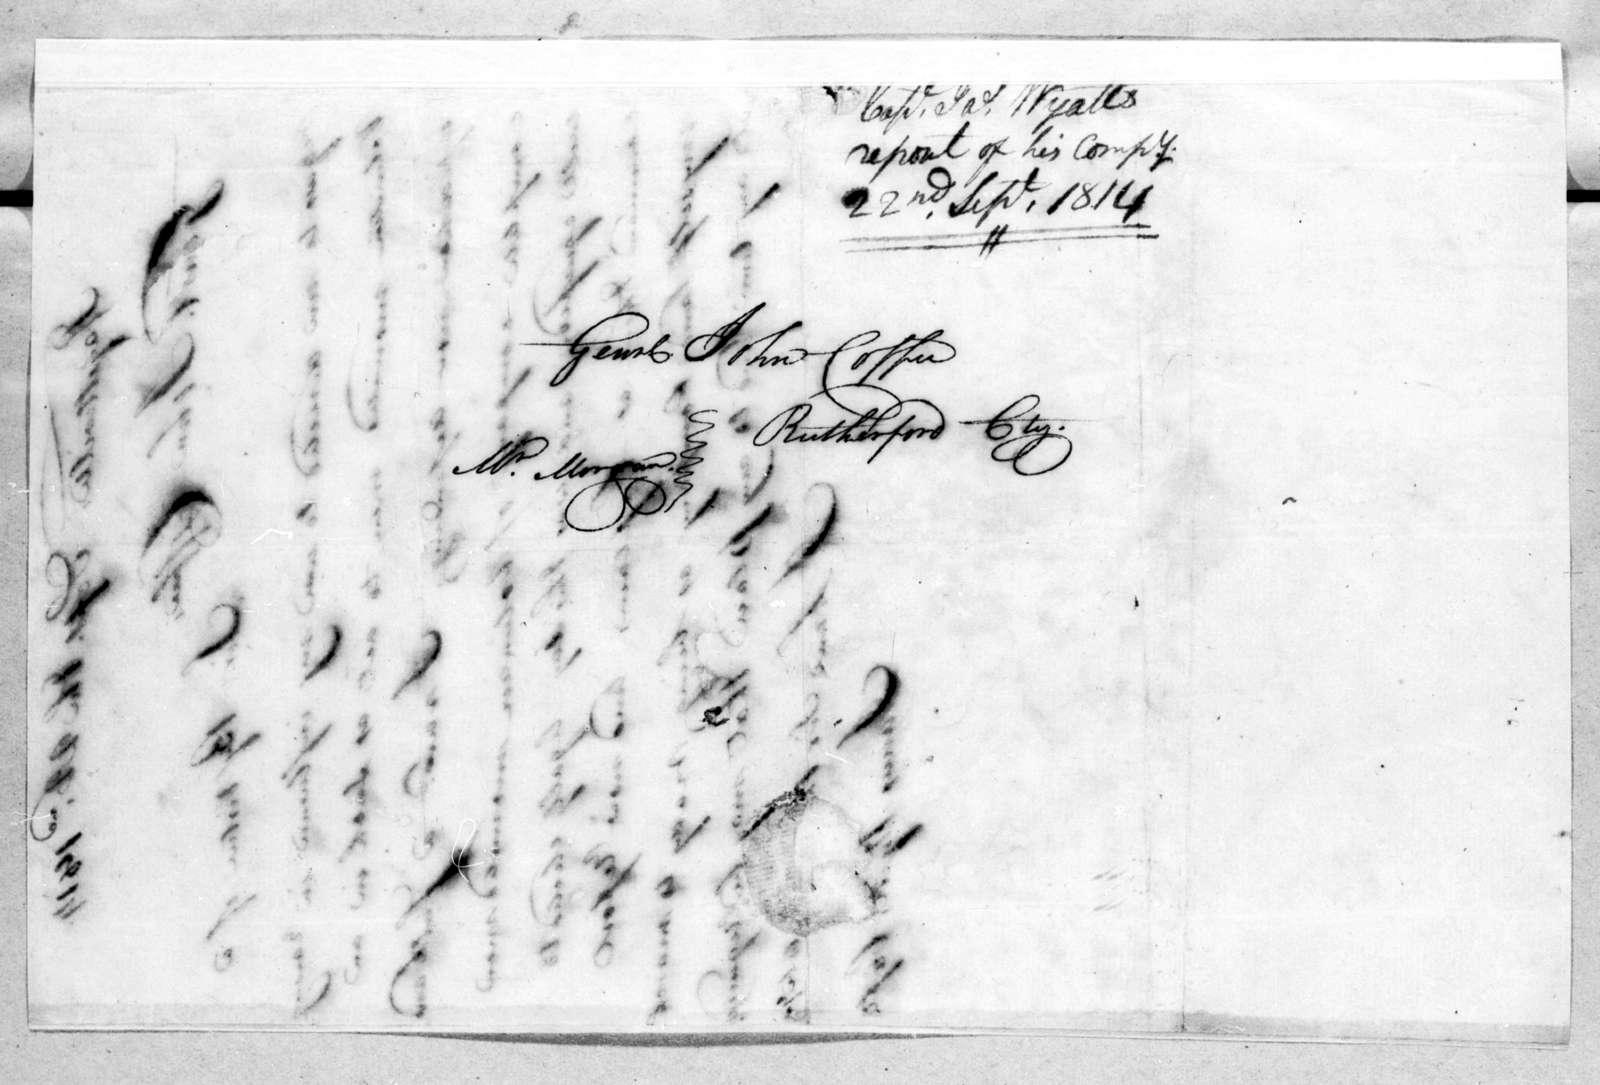 James Wyatt to John Coffee, September 22, 1814